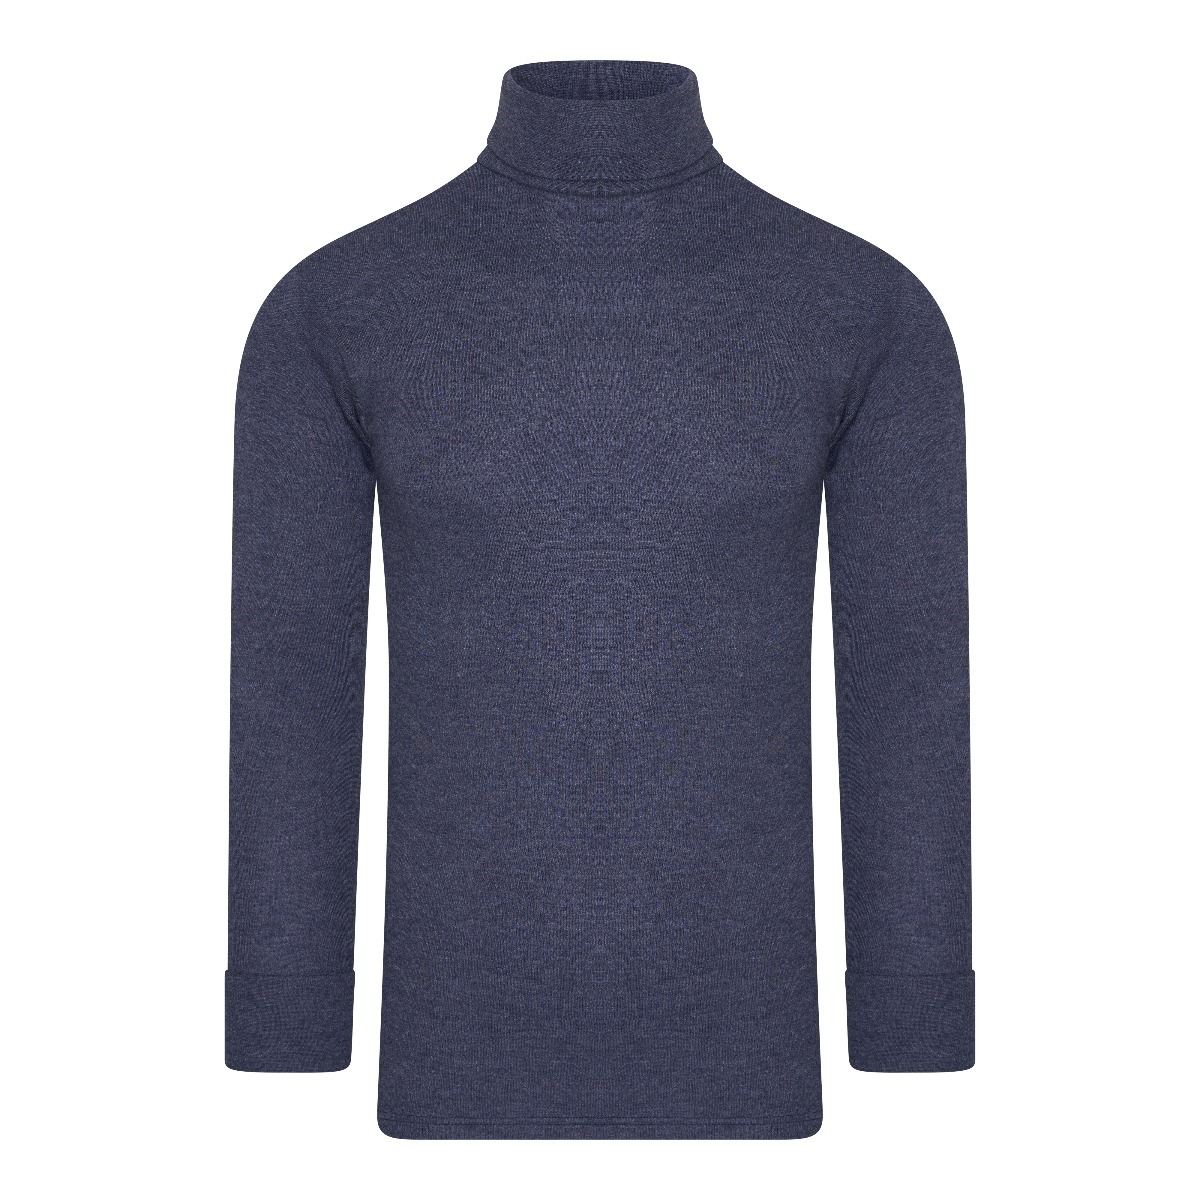 Beeren Thermo Unisex Shirt Col Lange Mouw Marine Xxl